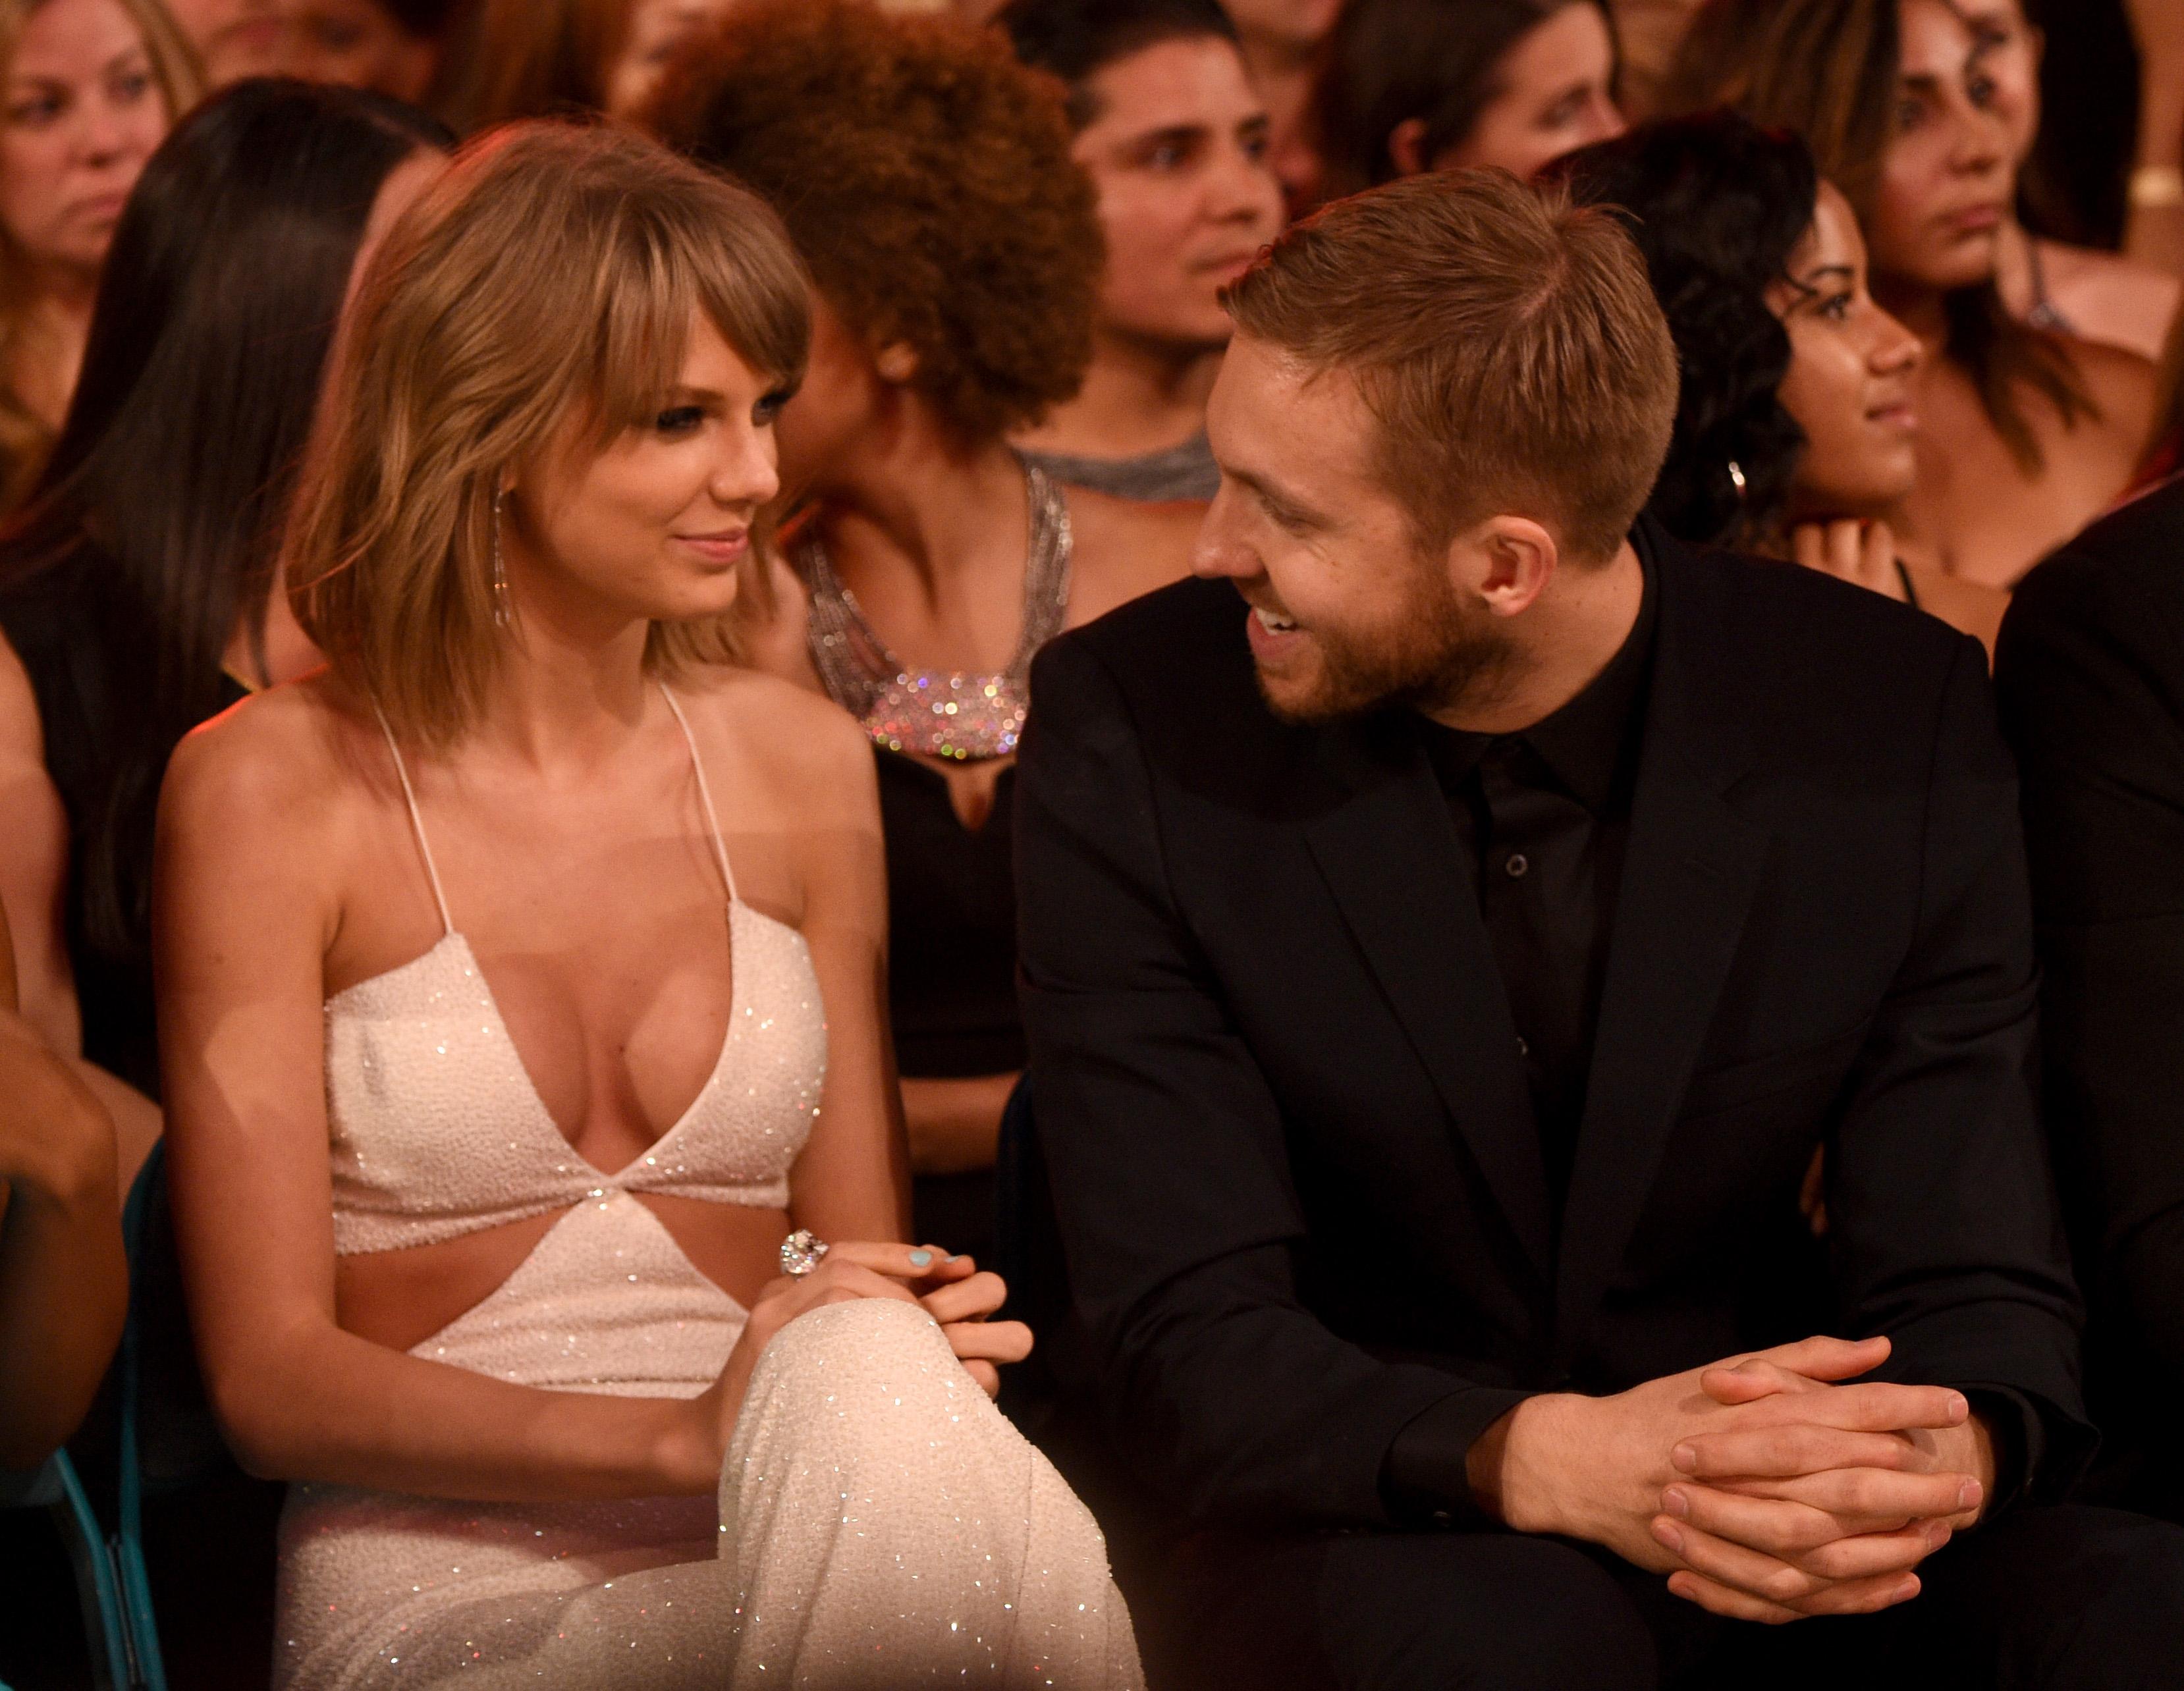 LAS VEGAS, NV - MAY 17:  Recording artists Taylor Swift (L) and Calvin Harris attend the 2015 Billboard Music Awards at MGM G